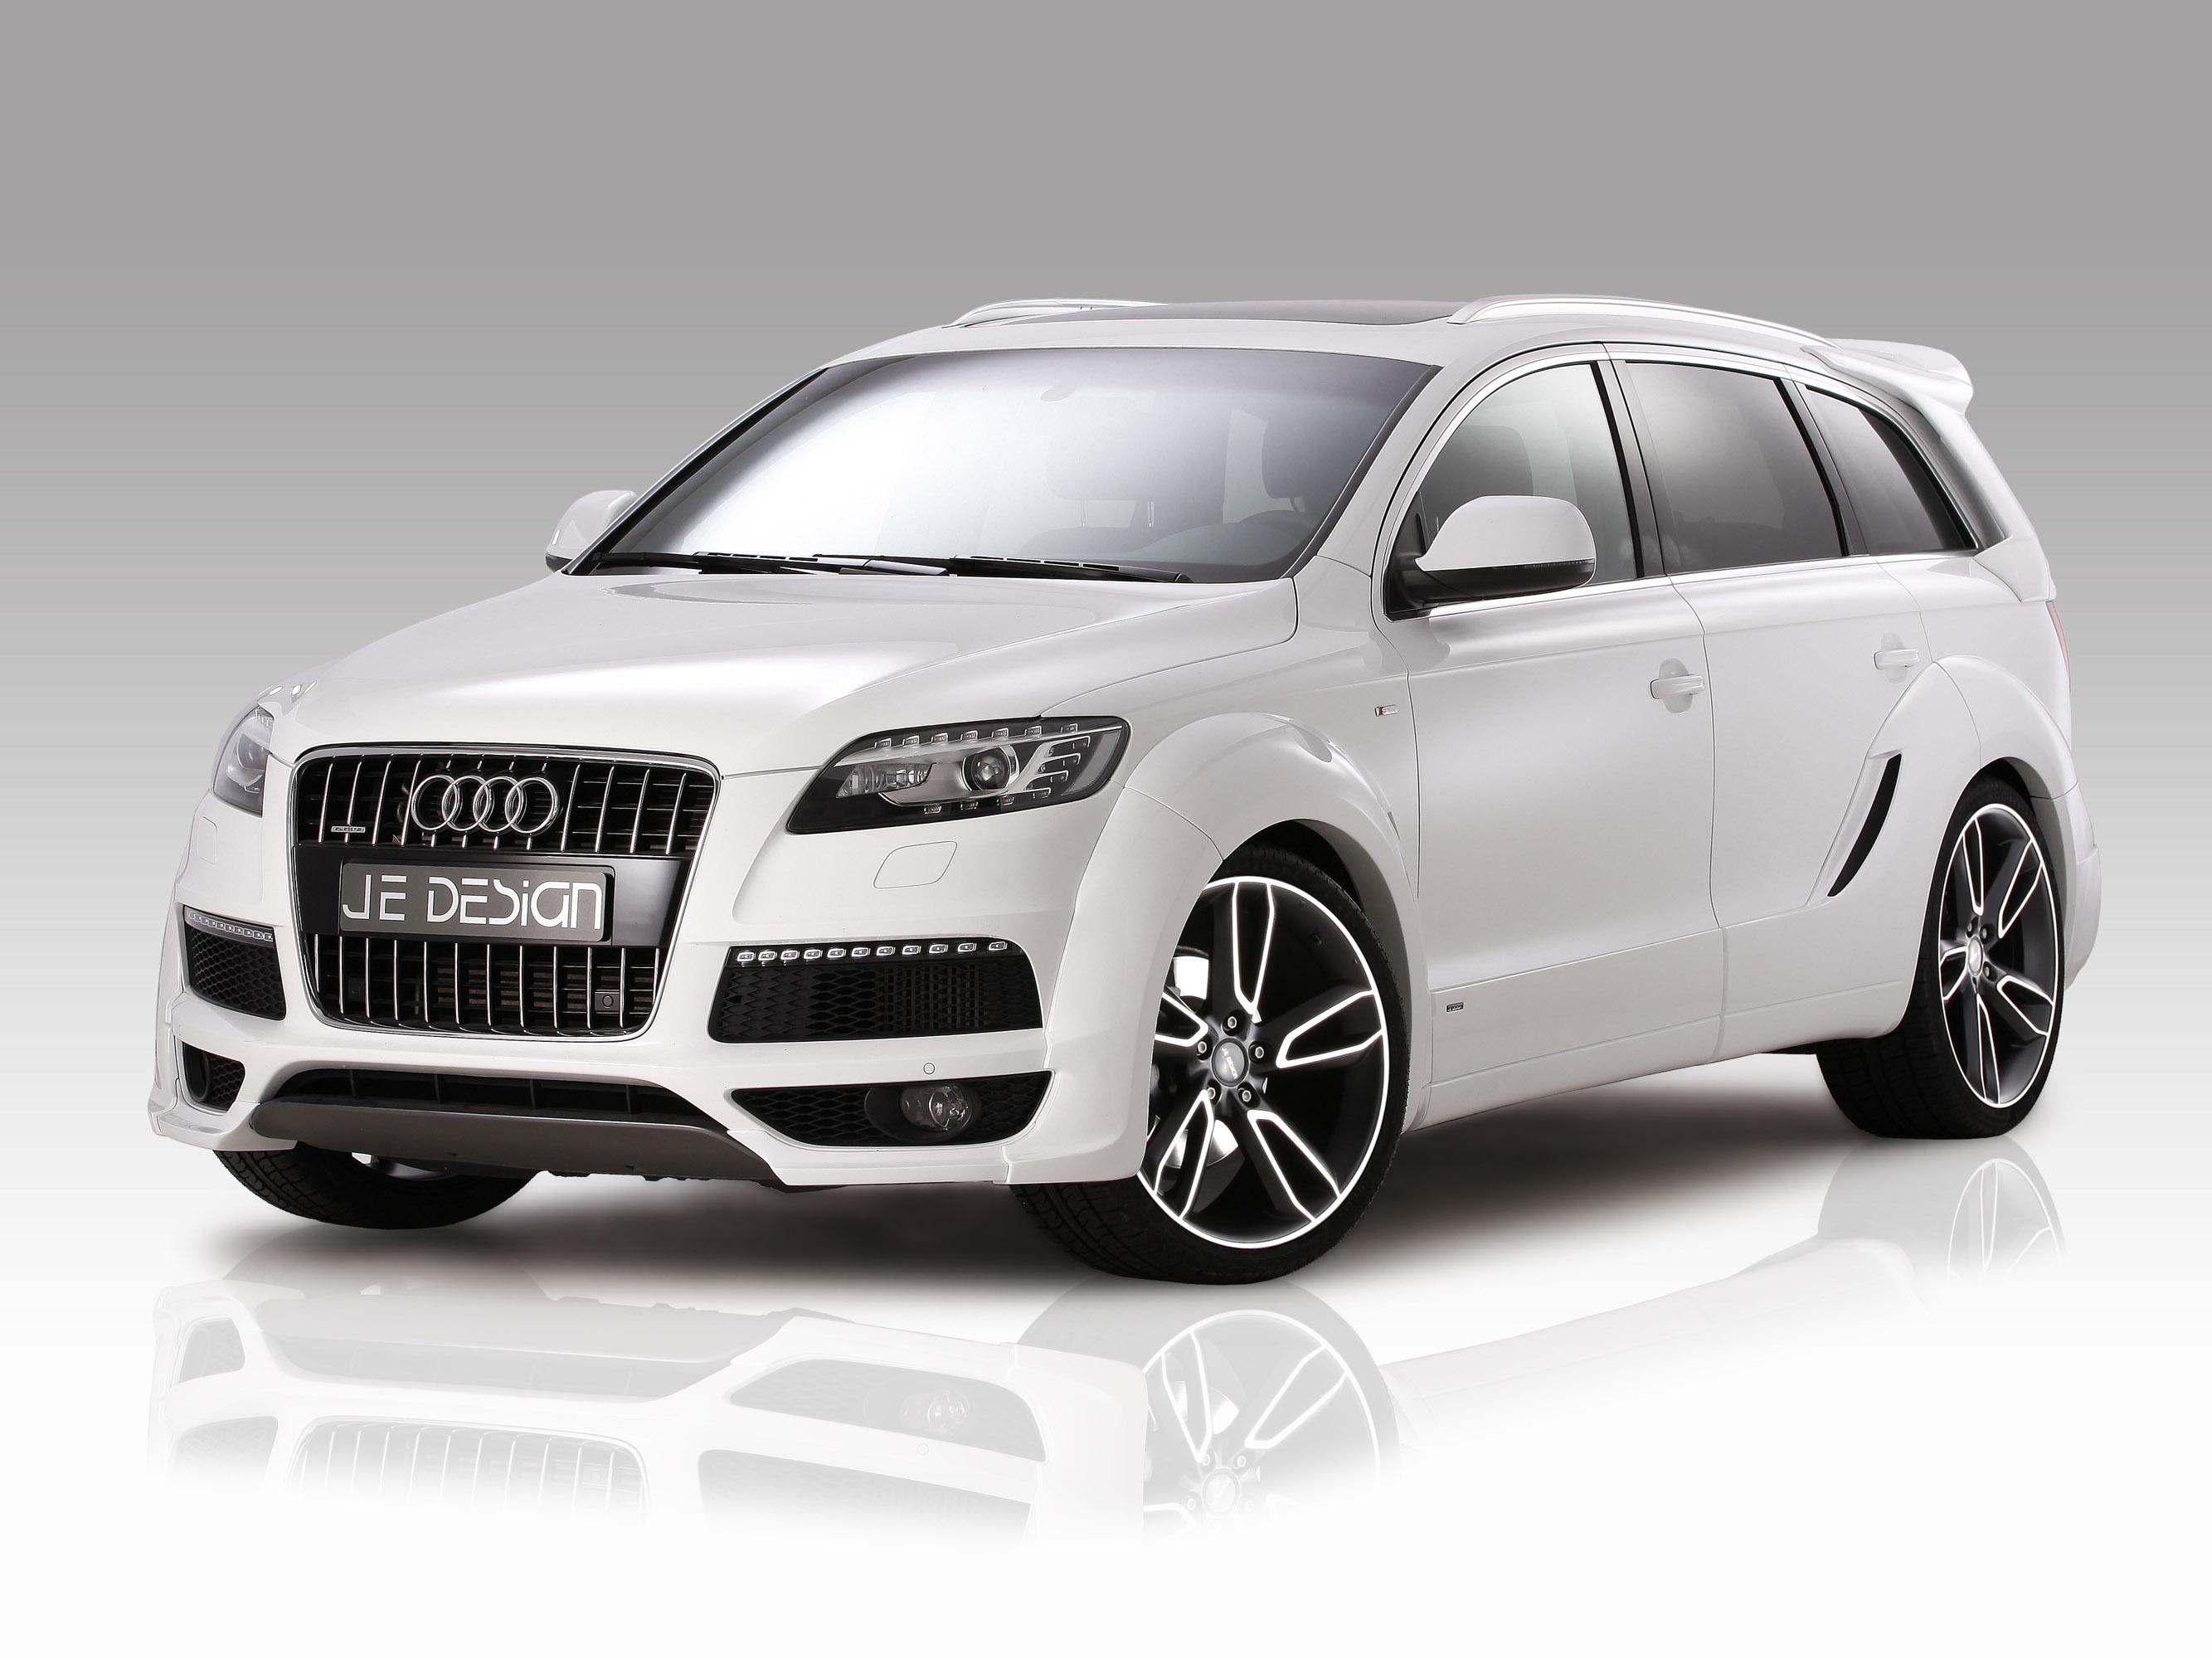 2011 Je Design Audi Q7 S